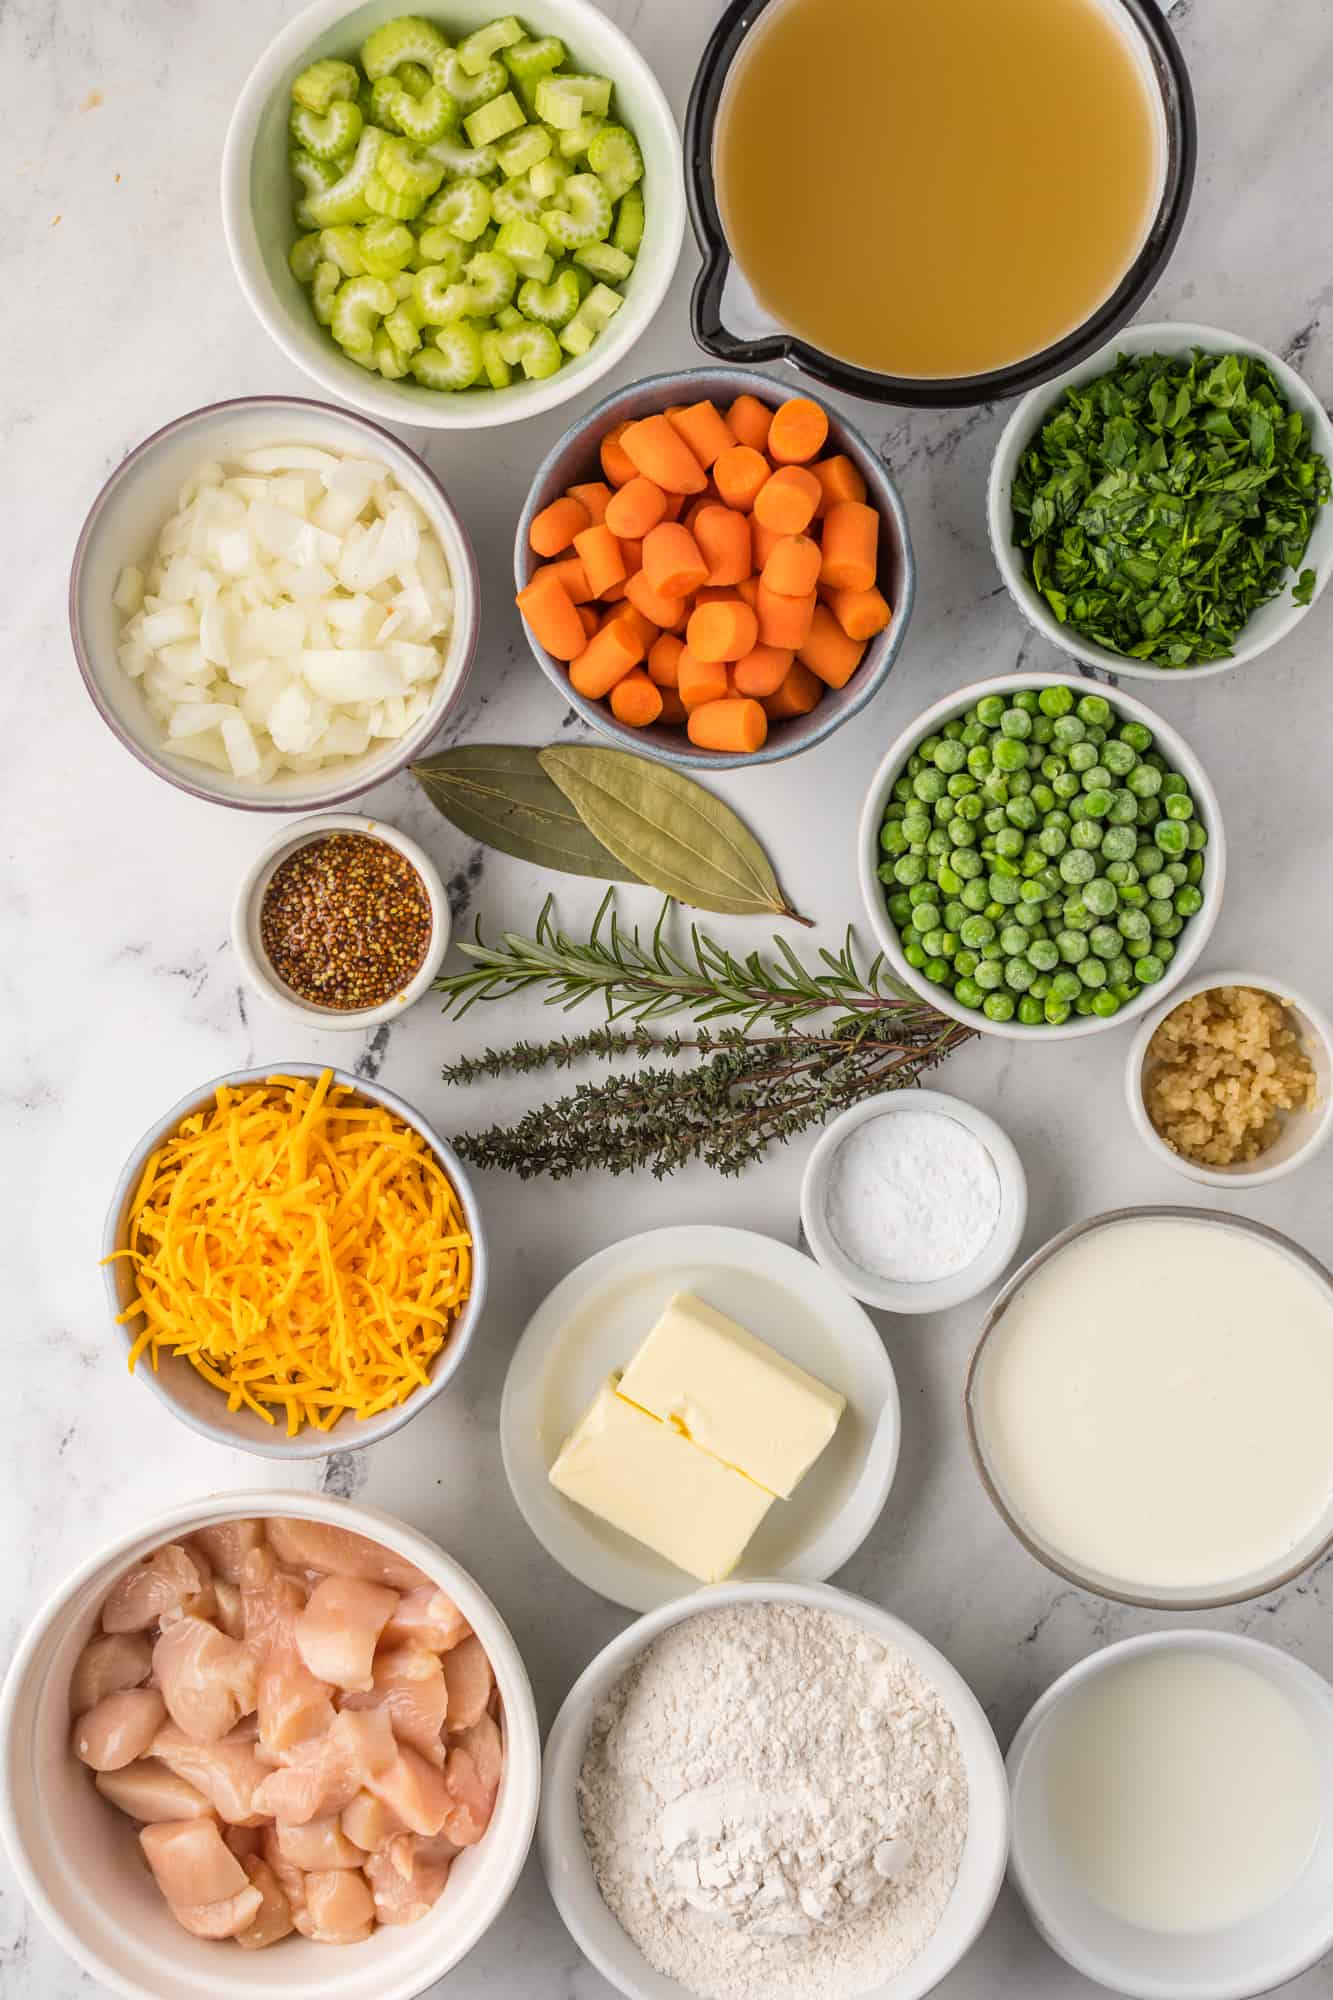 Ingredients needed to make Crock Pot Chicken and Cheese Dumplings